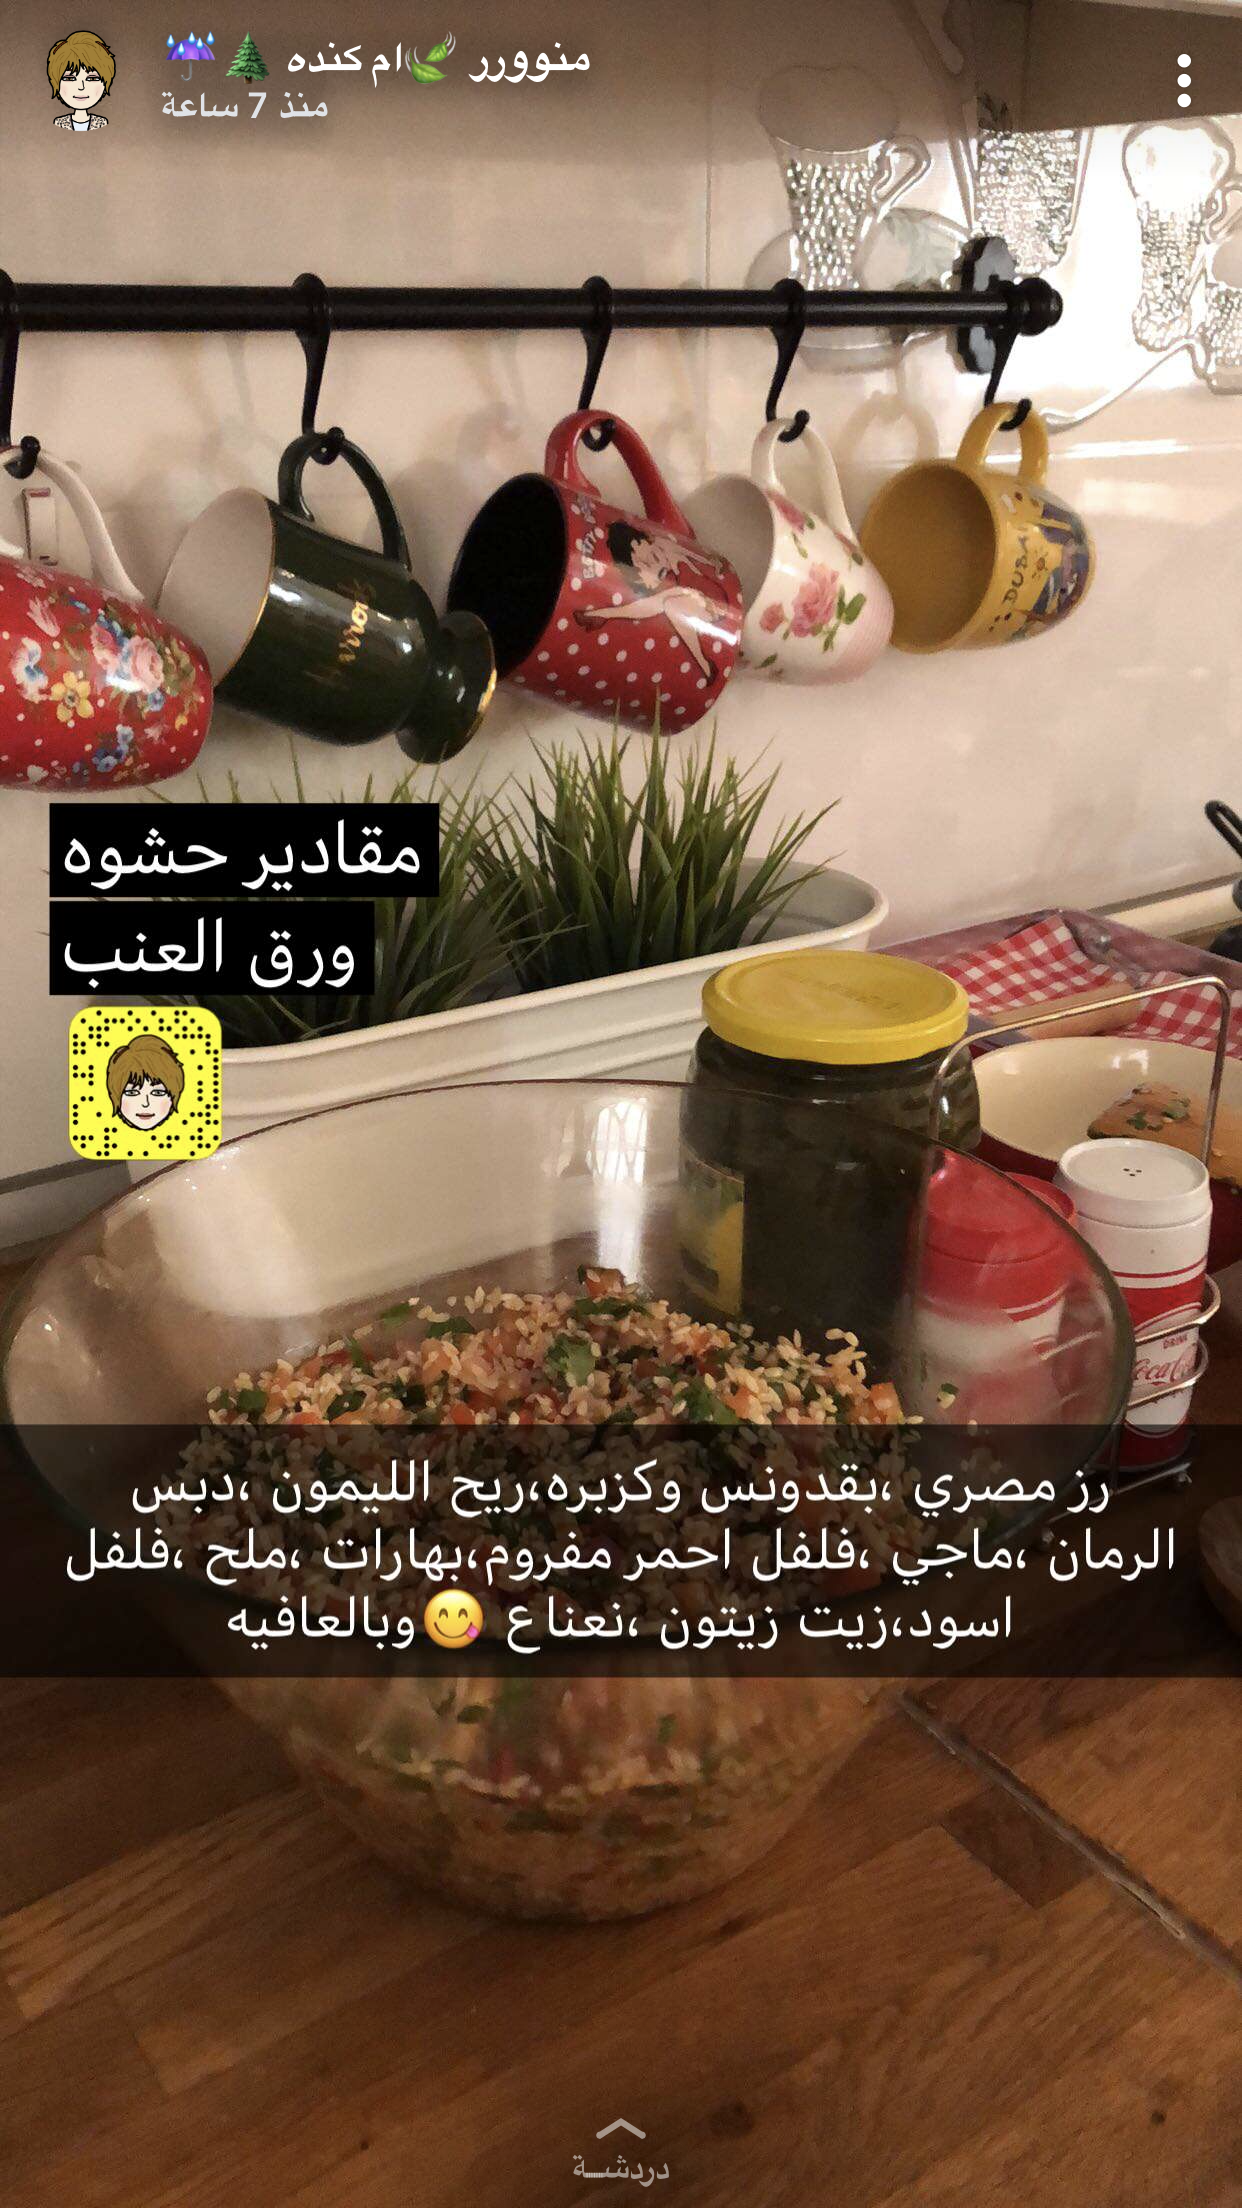 مقادير حشوة ورق العنب Arabic Food Cookout Food Food Receipes